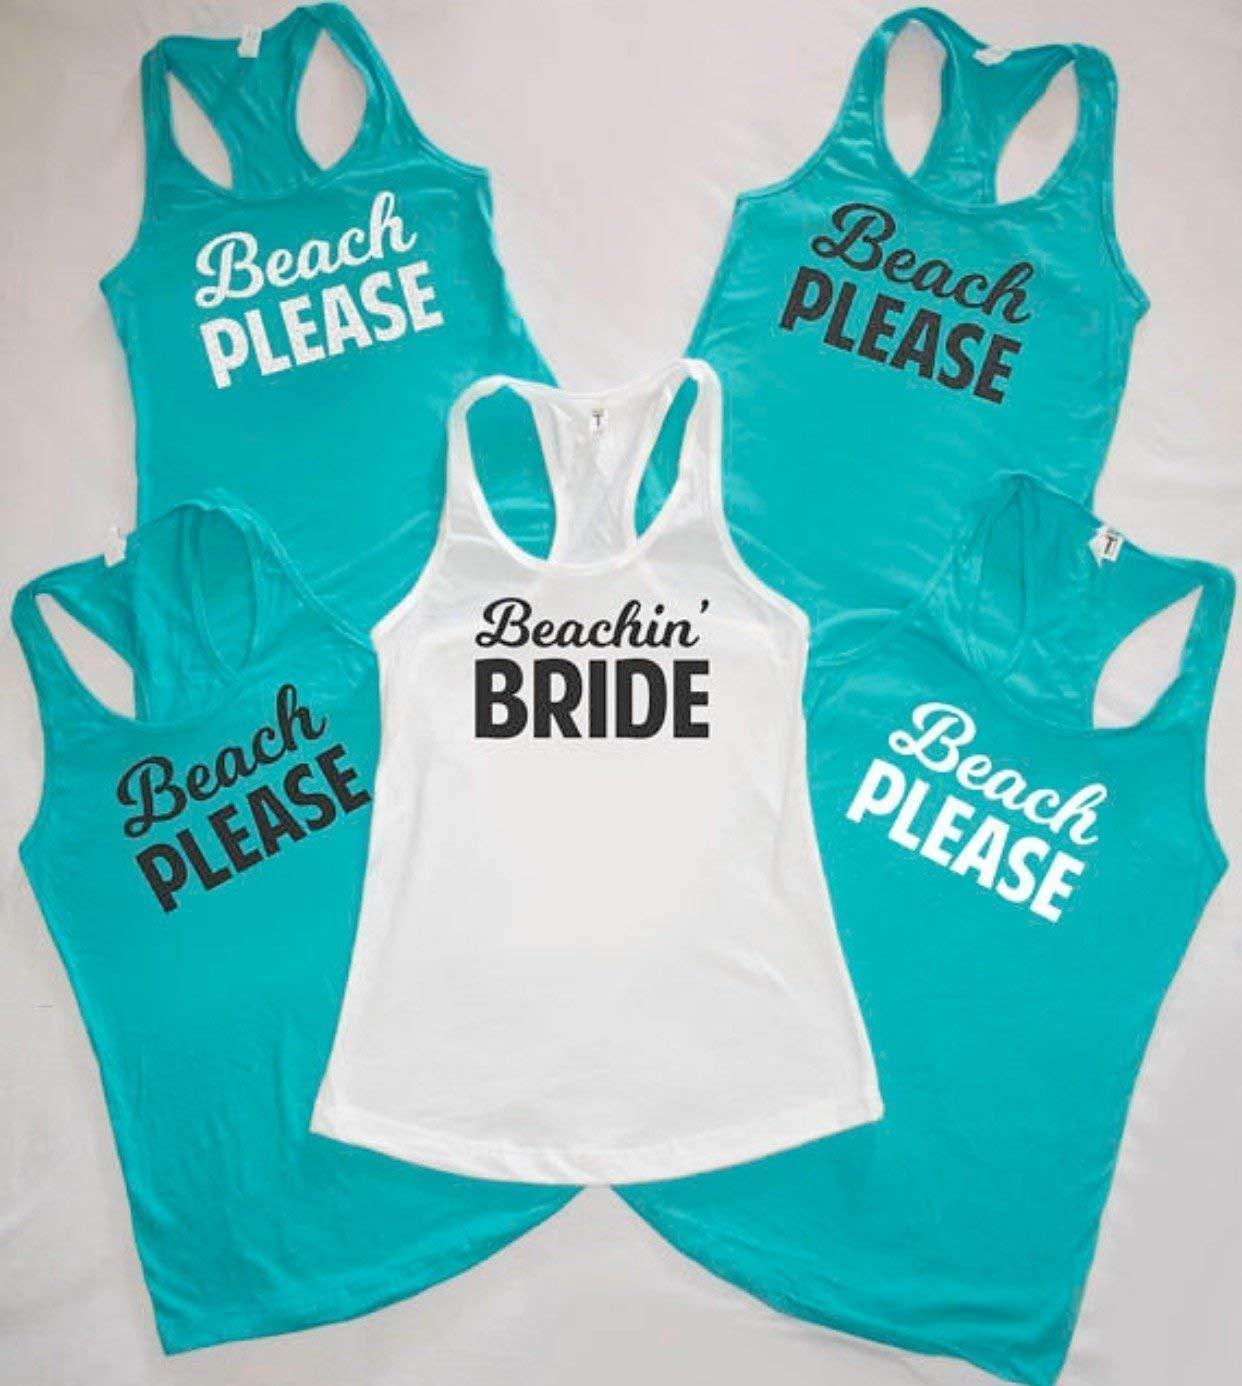 Bachelorette Party Favors Vneck Future Mrs Bridal Party T-Shirt Bridesmaid Shirts Cheers Bitches Tank Top Bachelorette Party Shirts